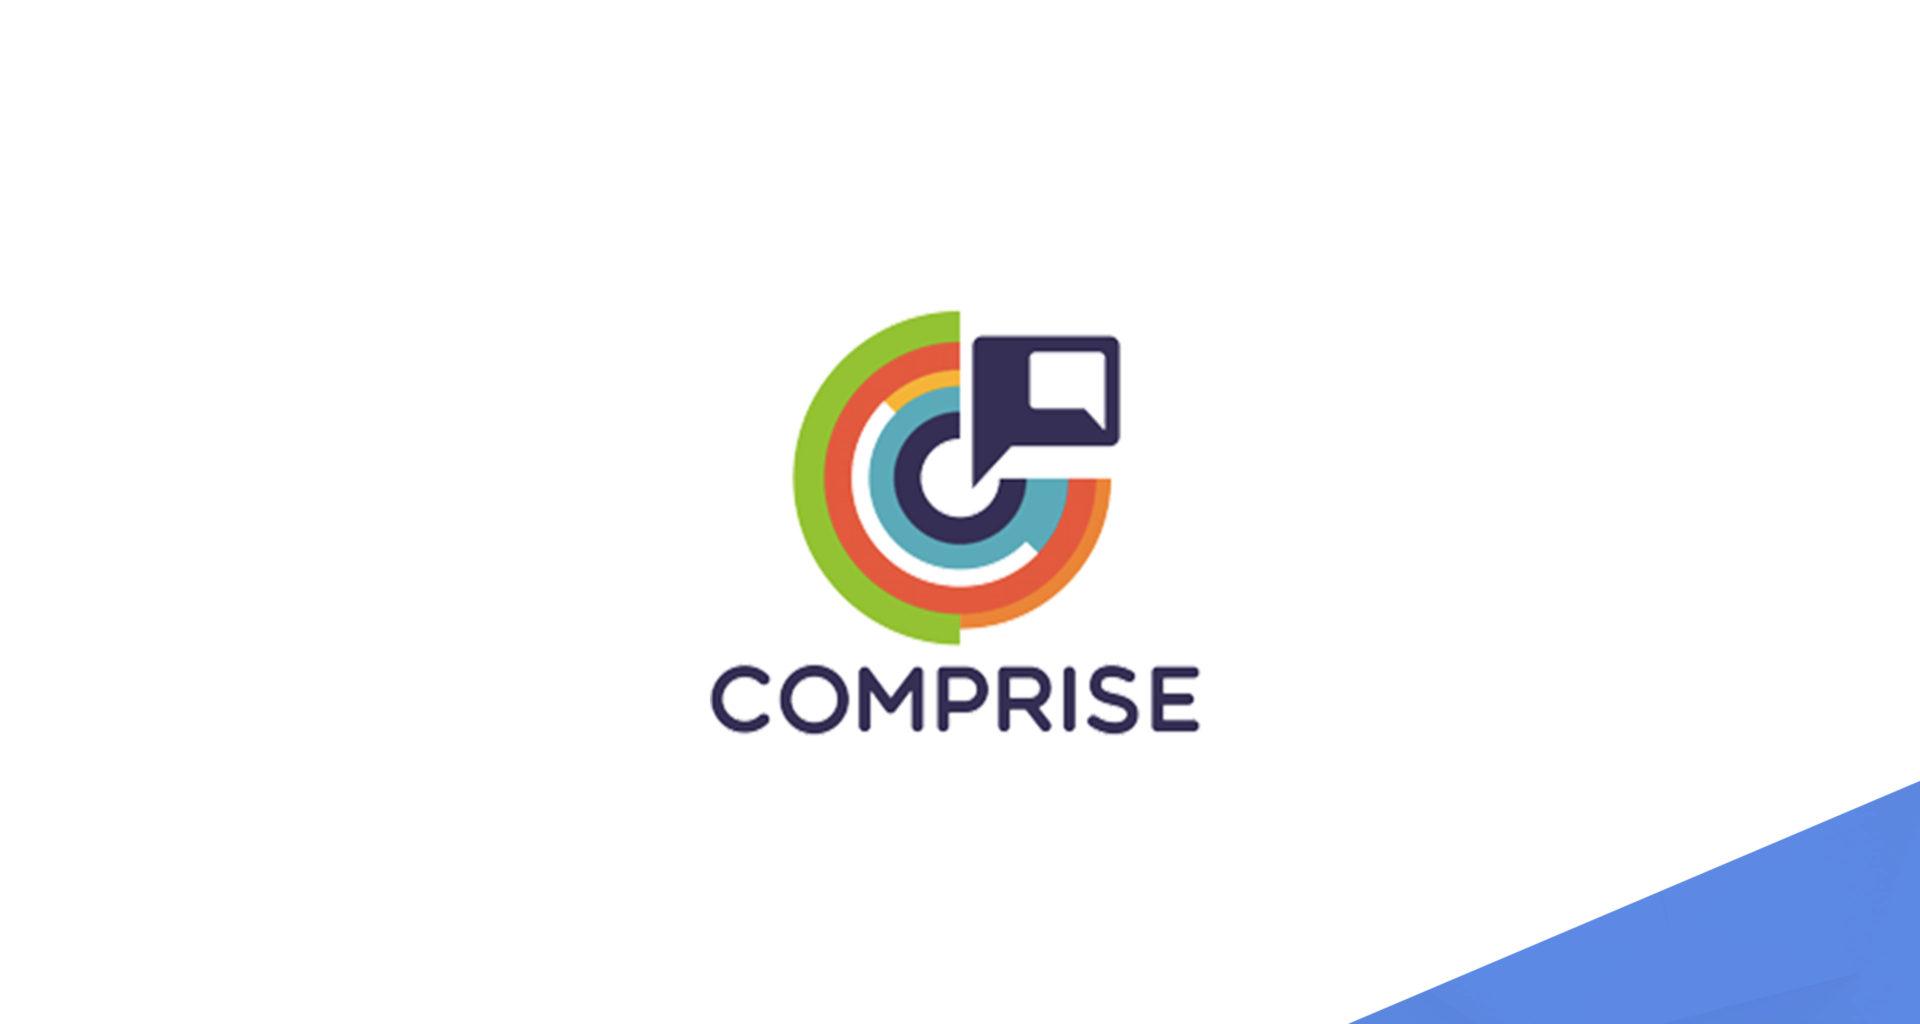 COMPRISE logo